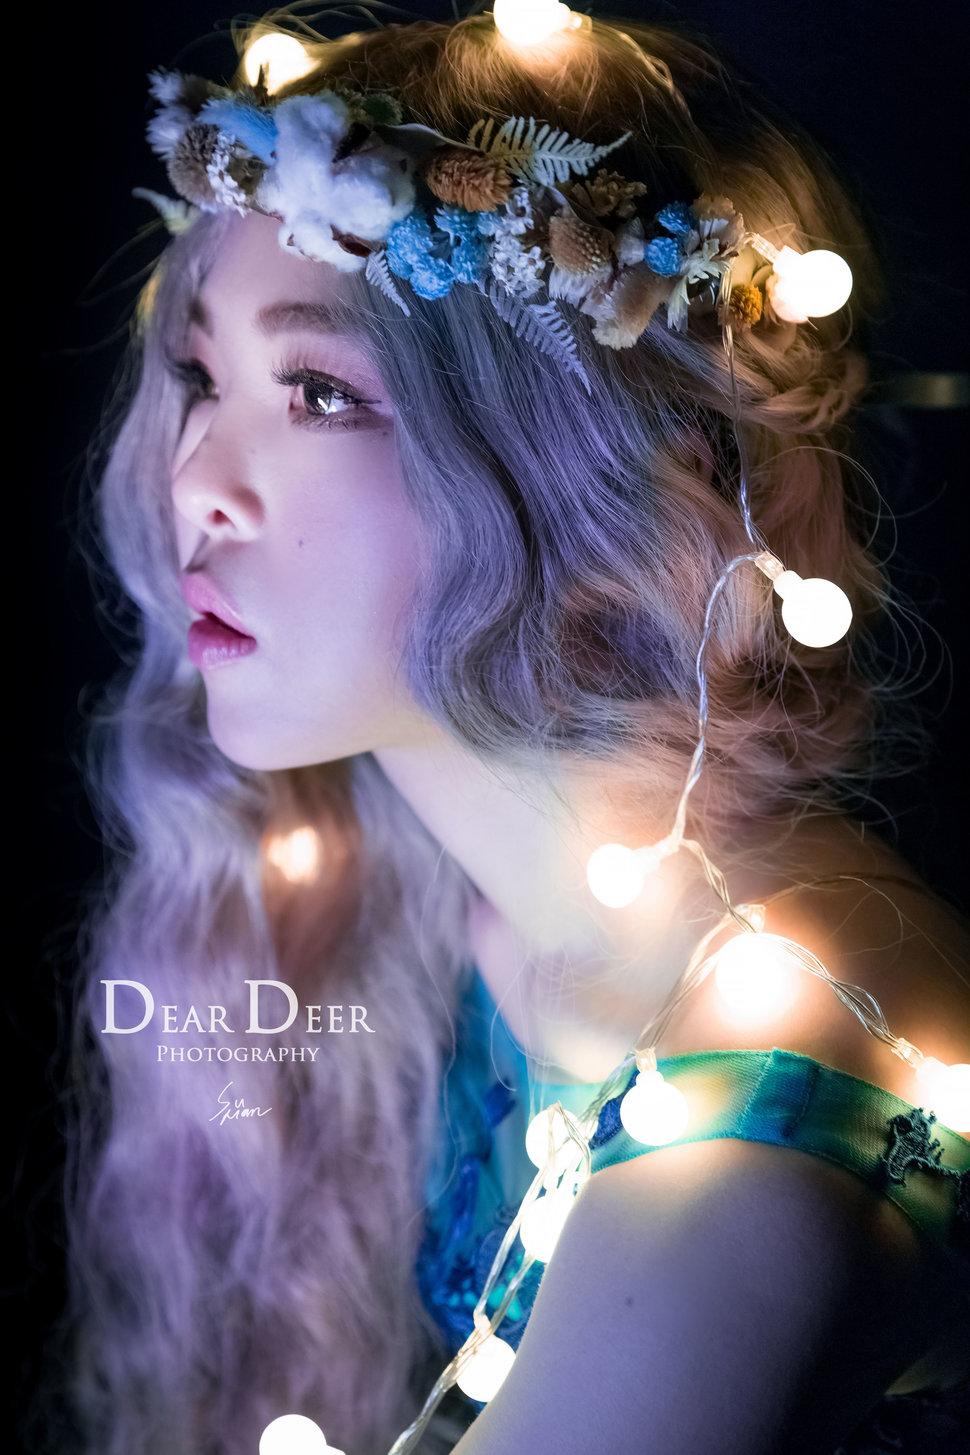 Dear Deer|夢幻精靈風格(編號:1561847) - Dear Deer鹿兒攝影|女攝影師蘇蔓 - 結婚吧